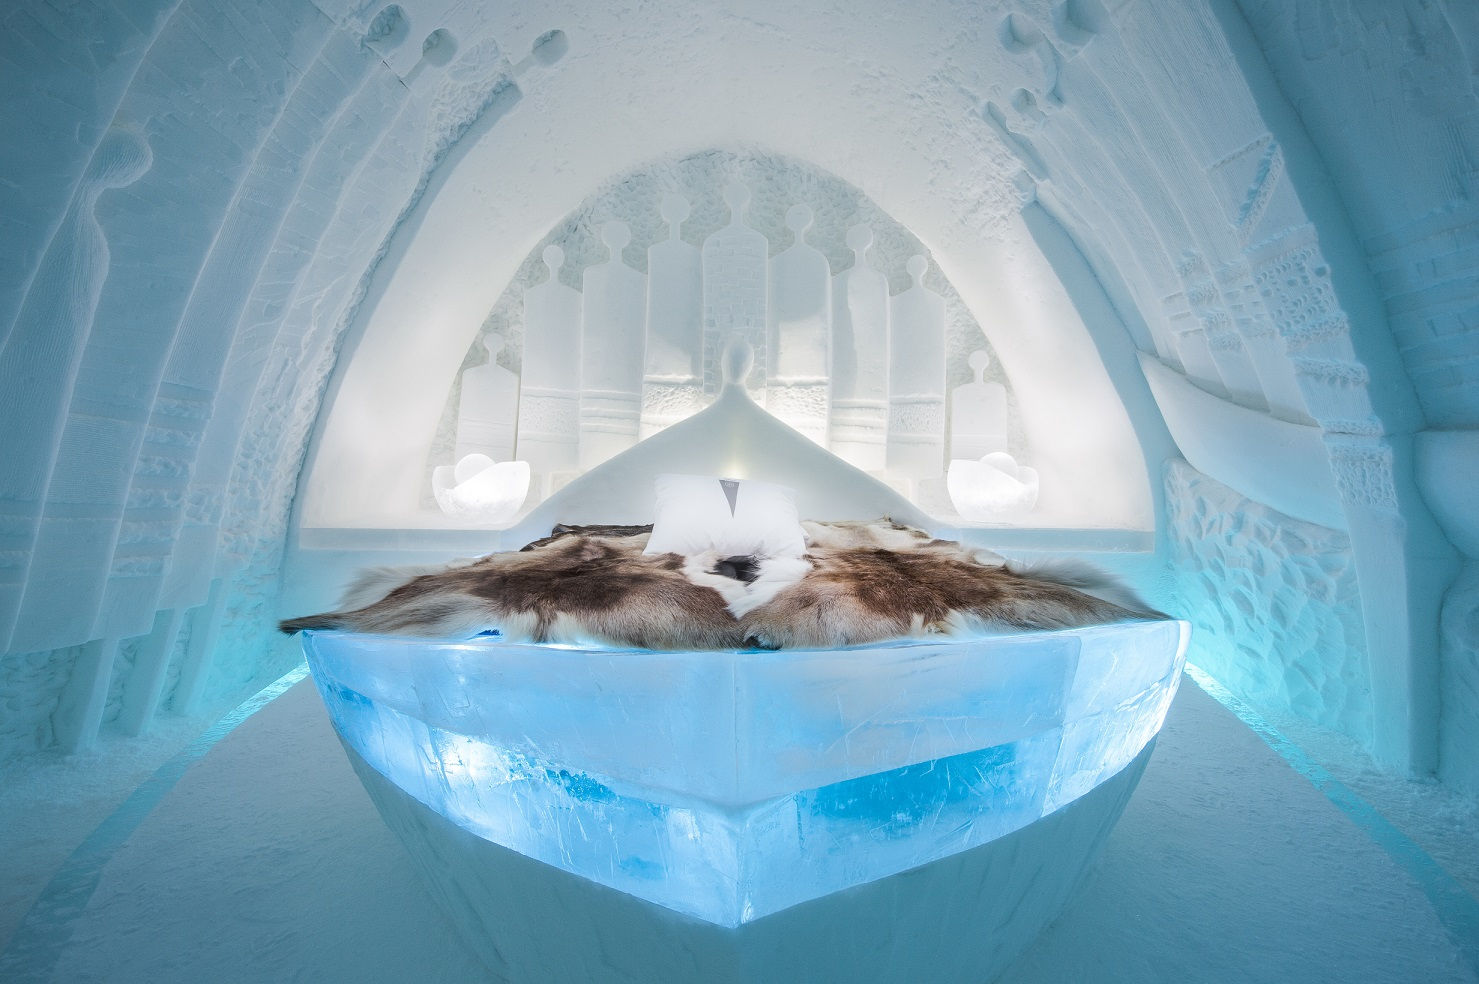 medium art suite daily travellers icehotel 28 Design Alem Teklu Anne Karin Krogevoll. Photo Asaf Kliger. 2